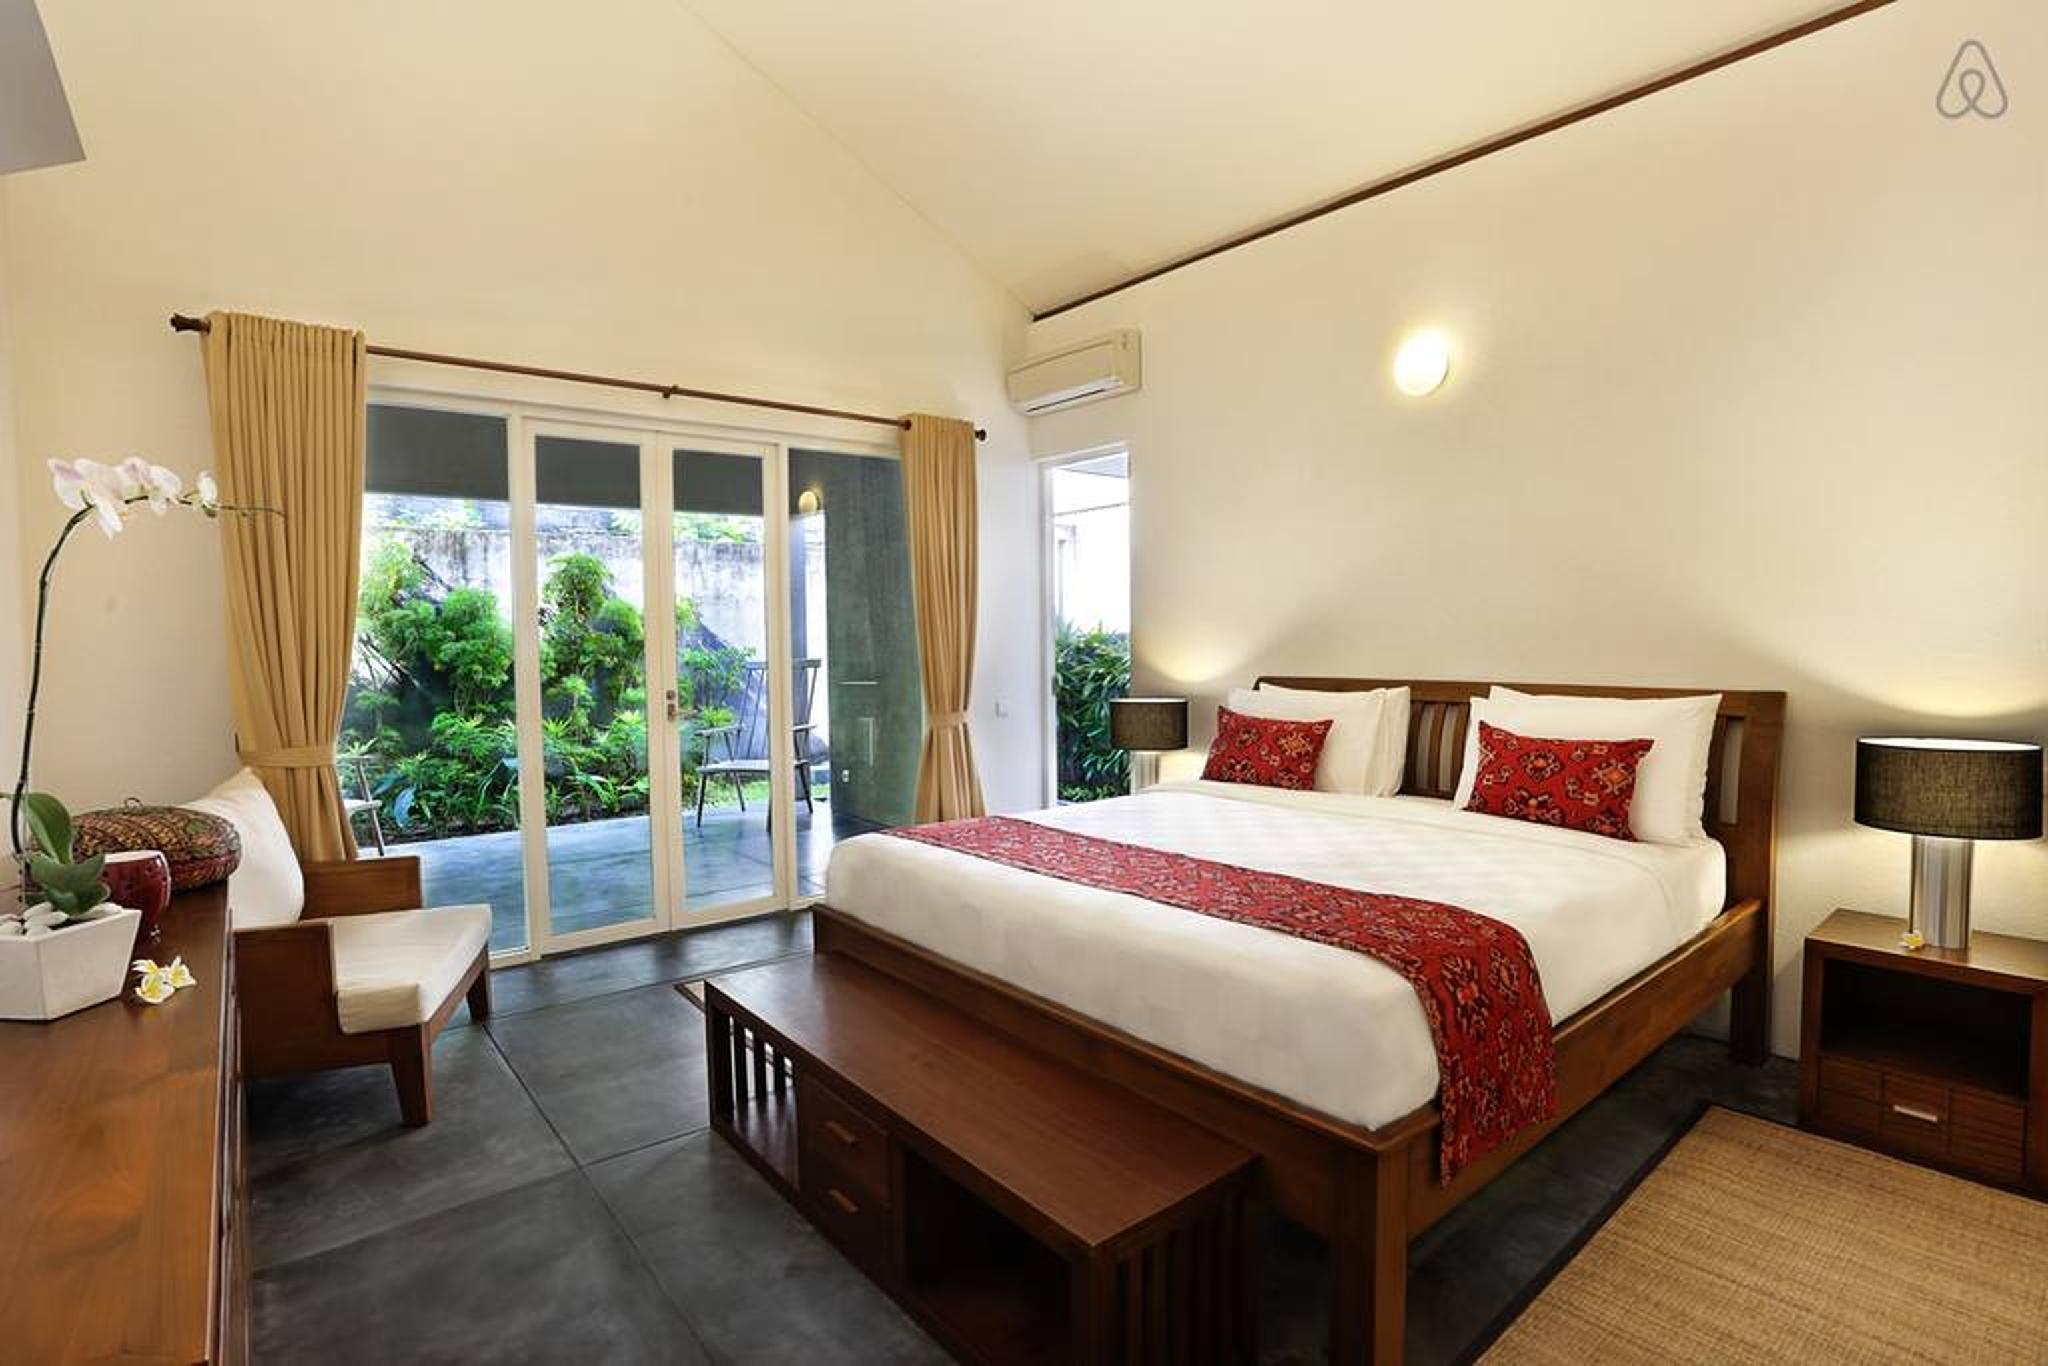 4 Bedroom Villa Maya Loka Seminyak Centre